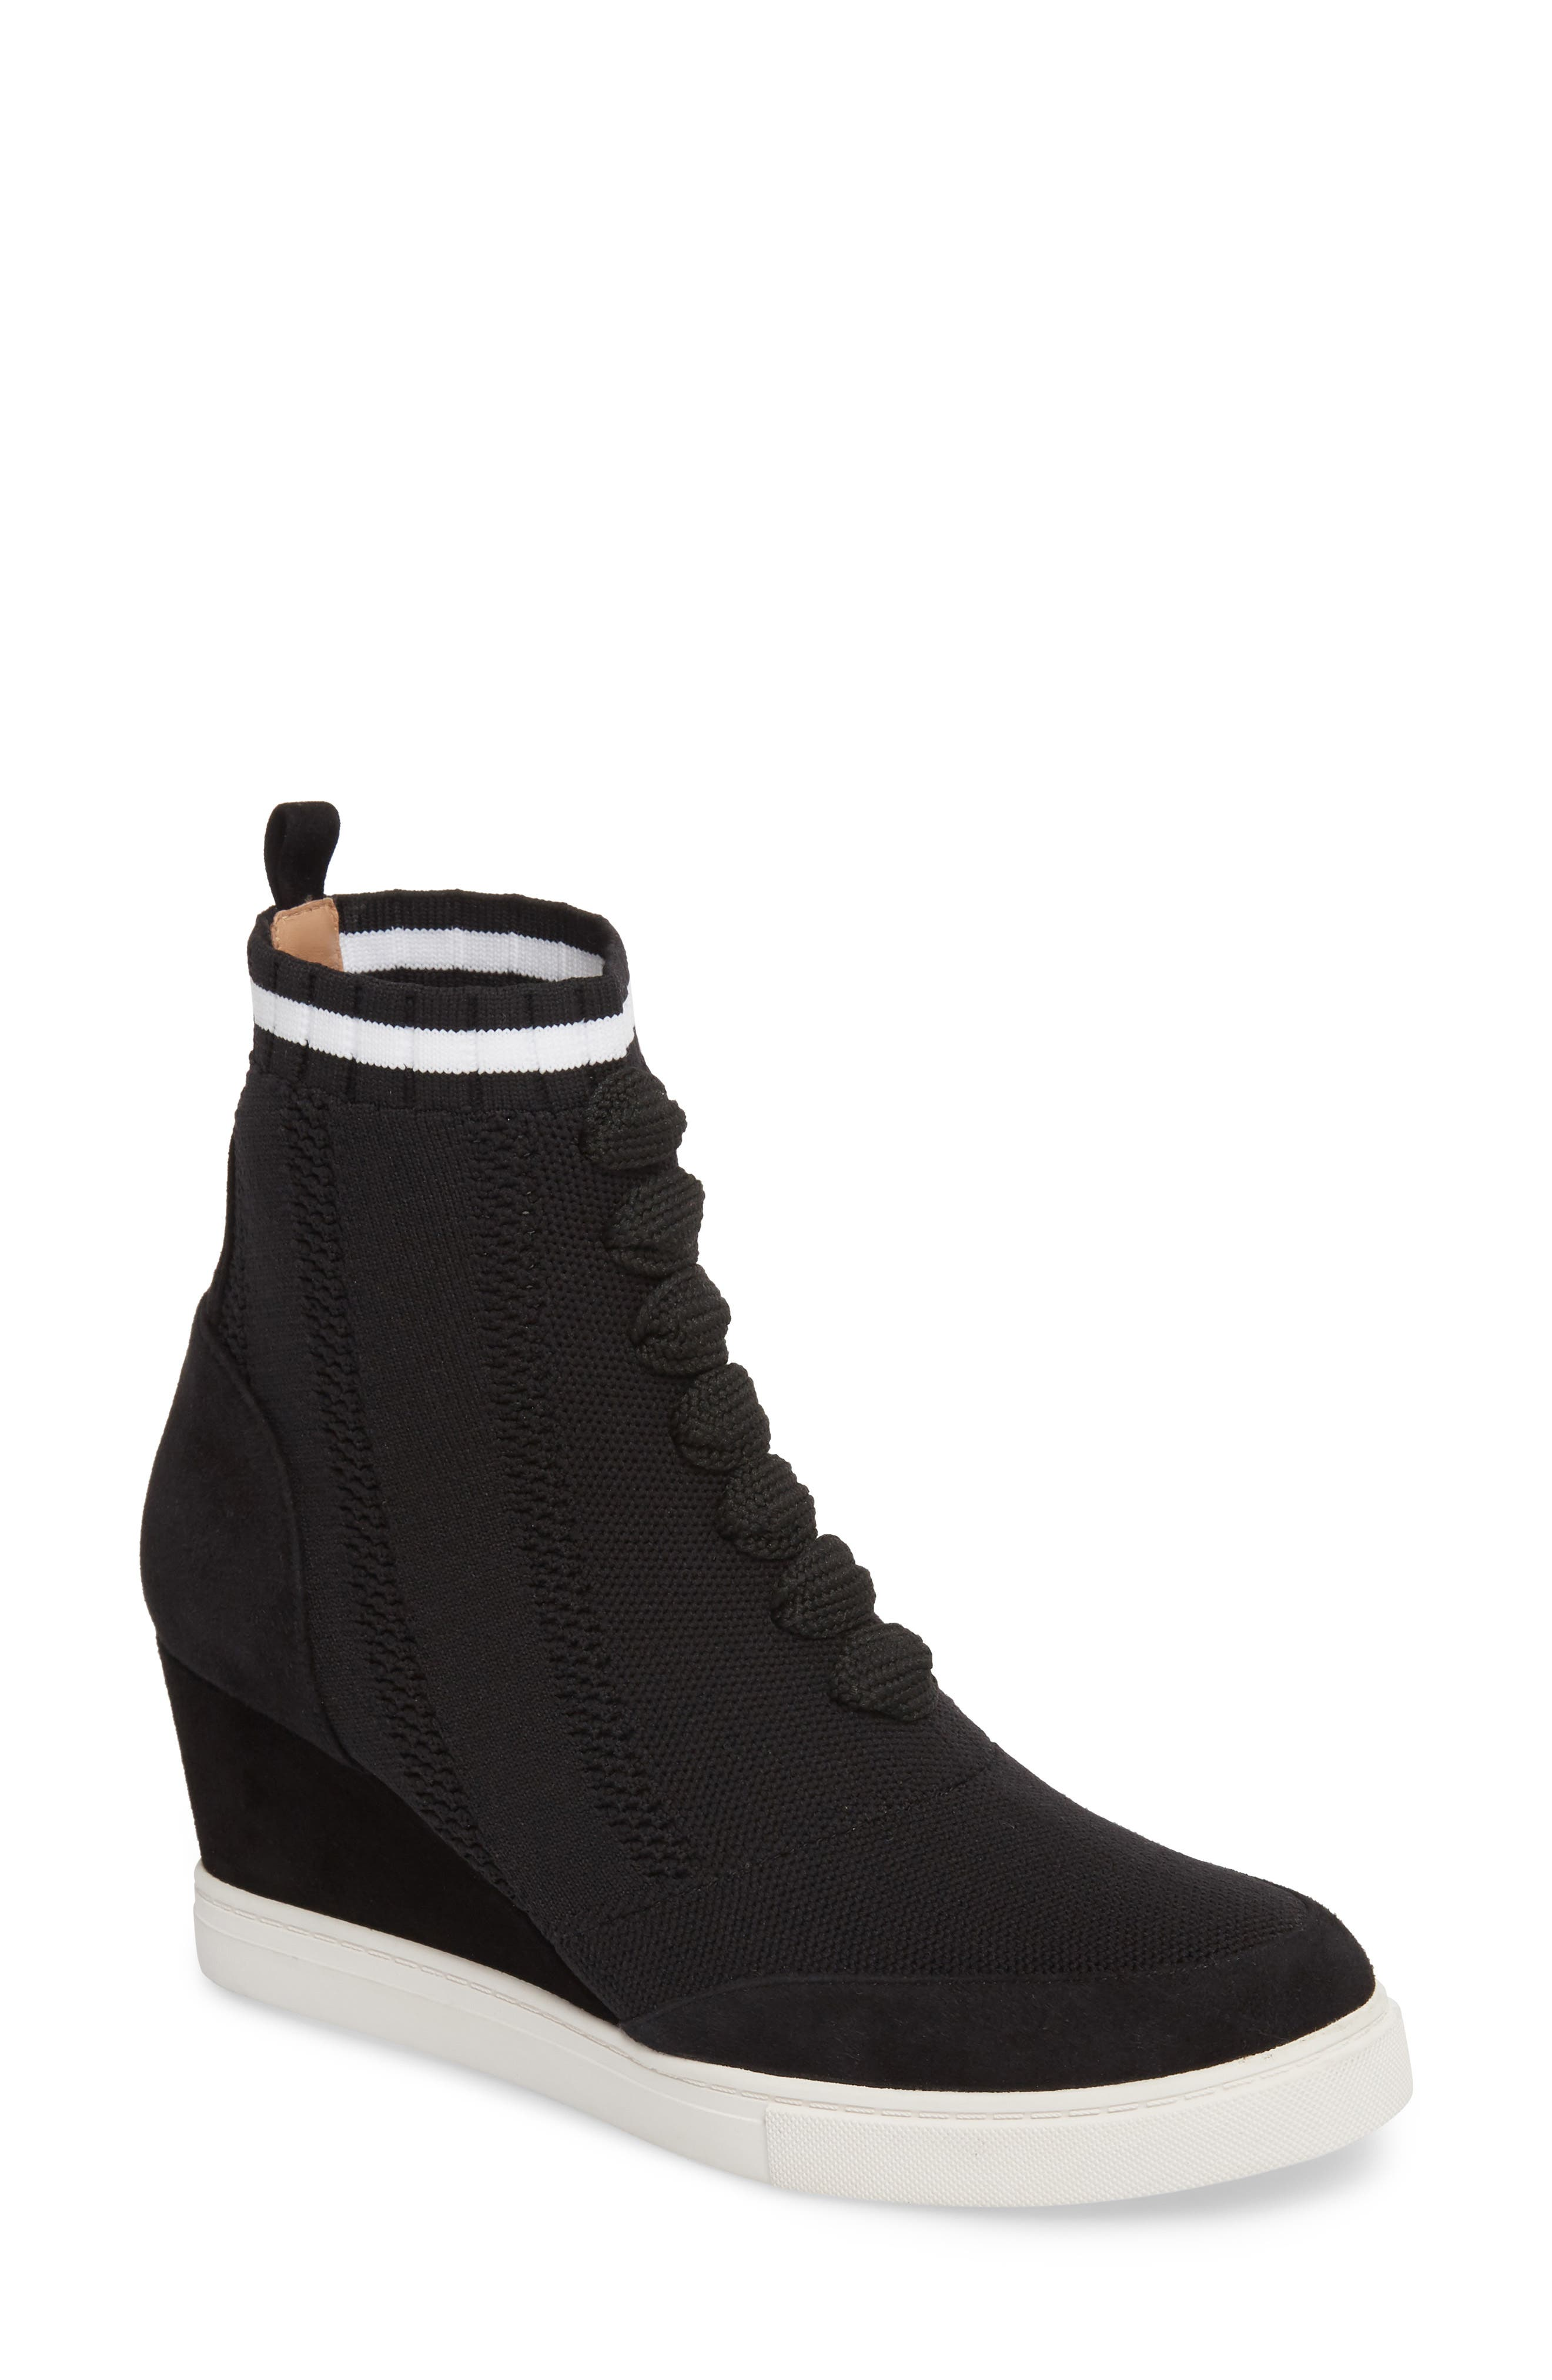 LINEA PAOLO,                             Fabiana Wedge Sneaker,                             Main thumbnail 1, color,                             BLACK SUEDE